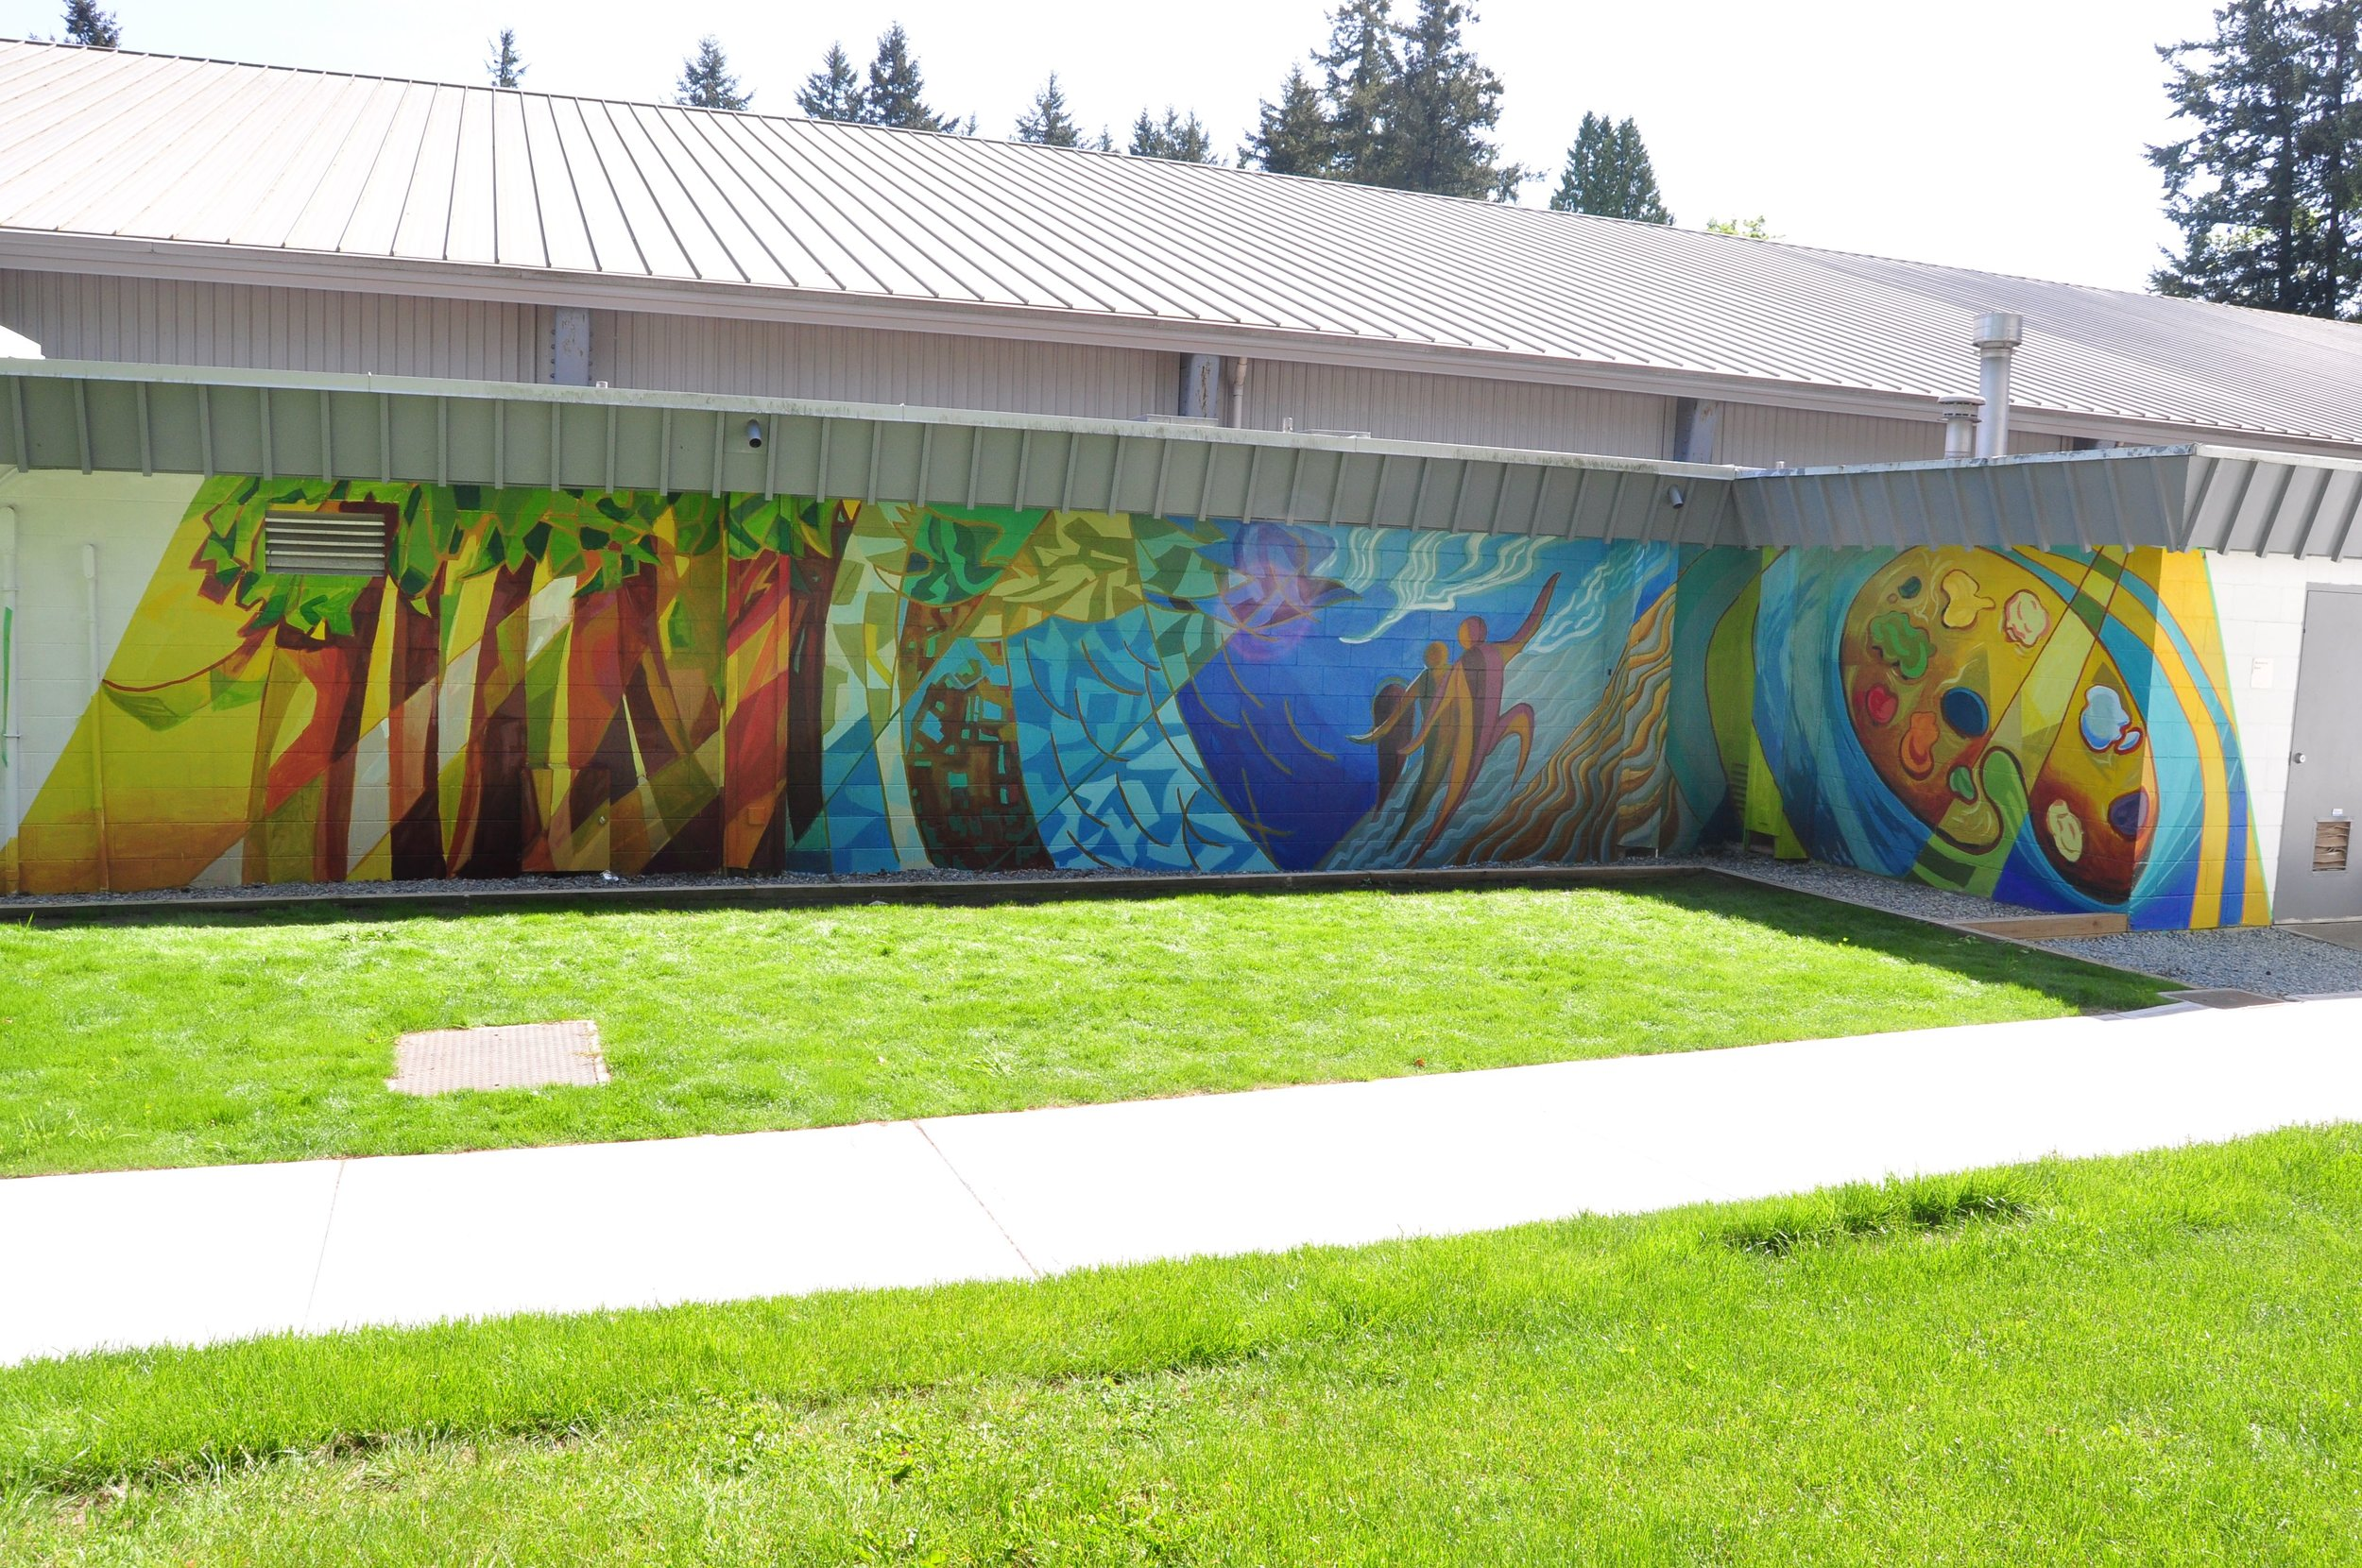 Semiahmoo Arts Mural, Acrylic paint, 2014, Richard Tetrault, Mallory Donen, Adam Lipschultz, Jeff Wilson, Jolayne Devente, Centennial Arena (North Facing Wall), White Rock, BC